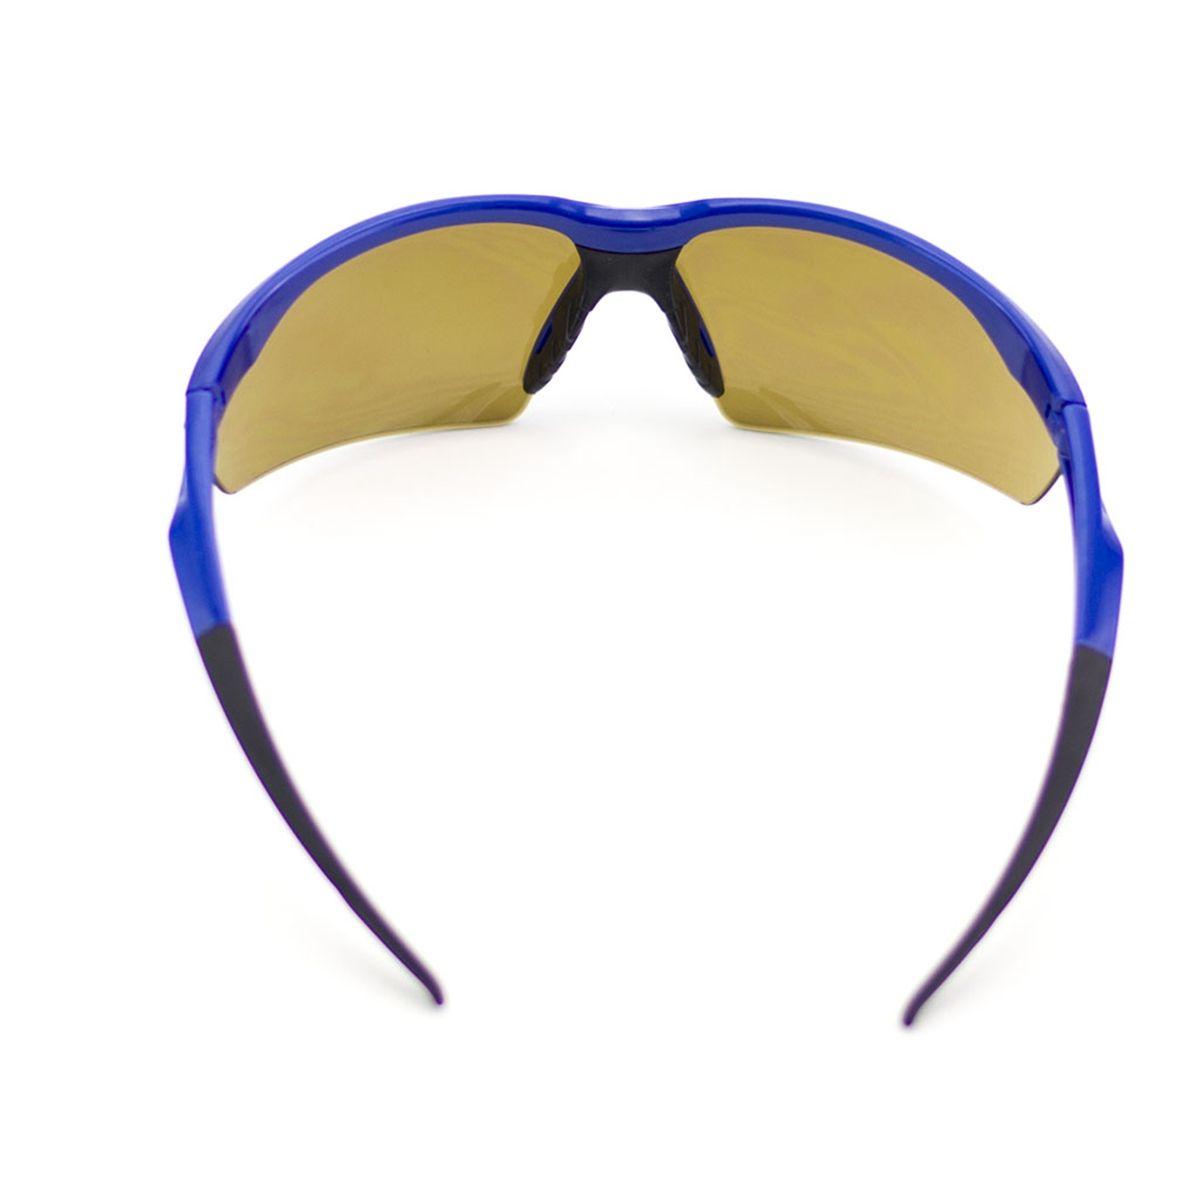 Óculos de Segurança Kalipso Veneza Ca 35157 Com Apoio Nasal